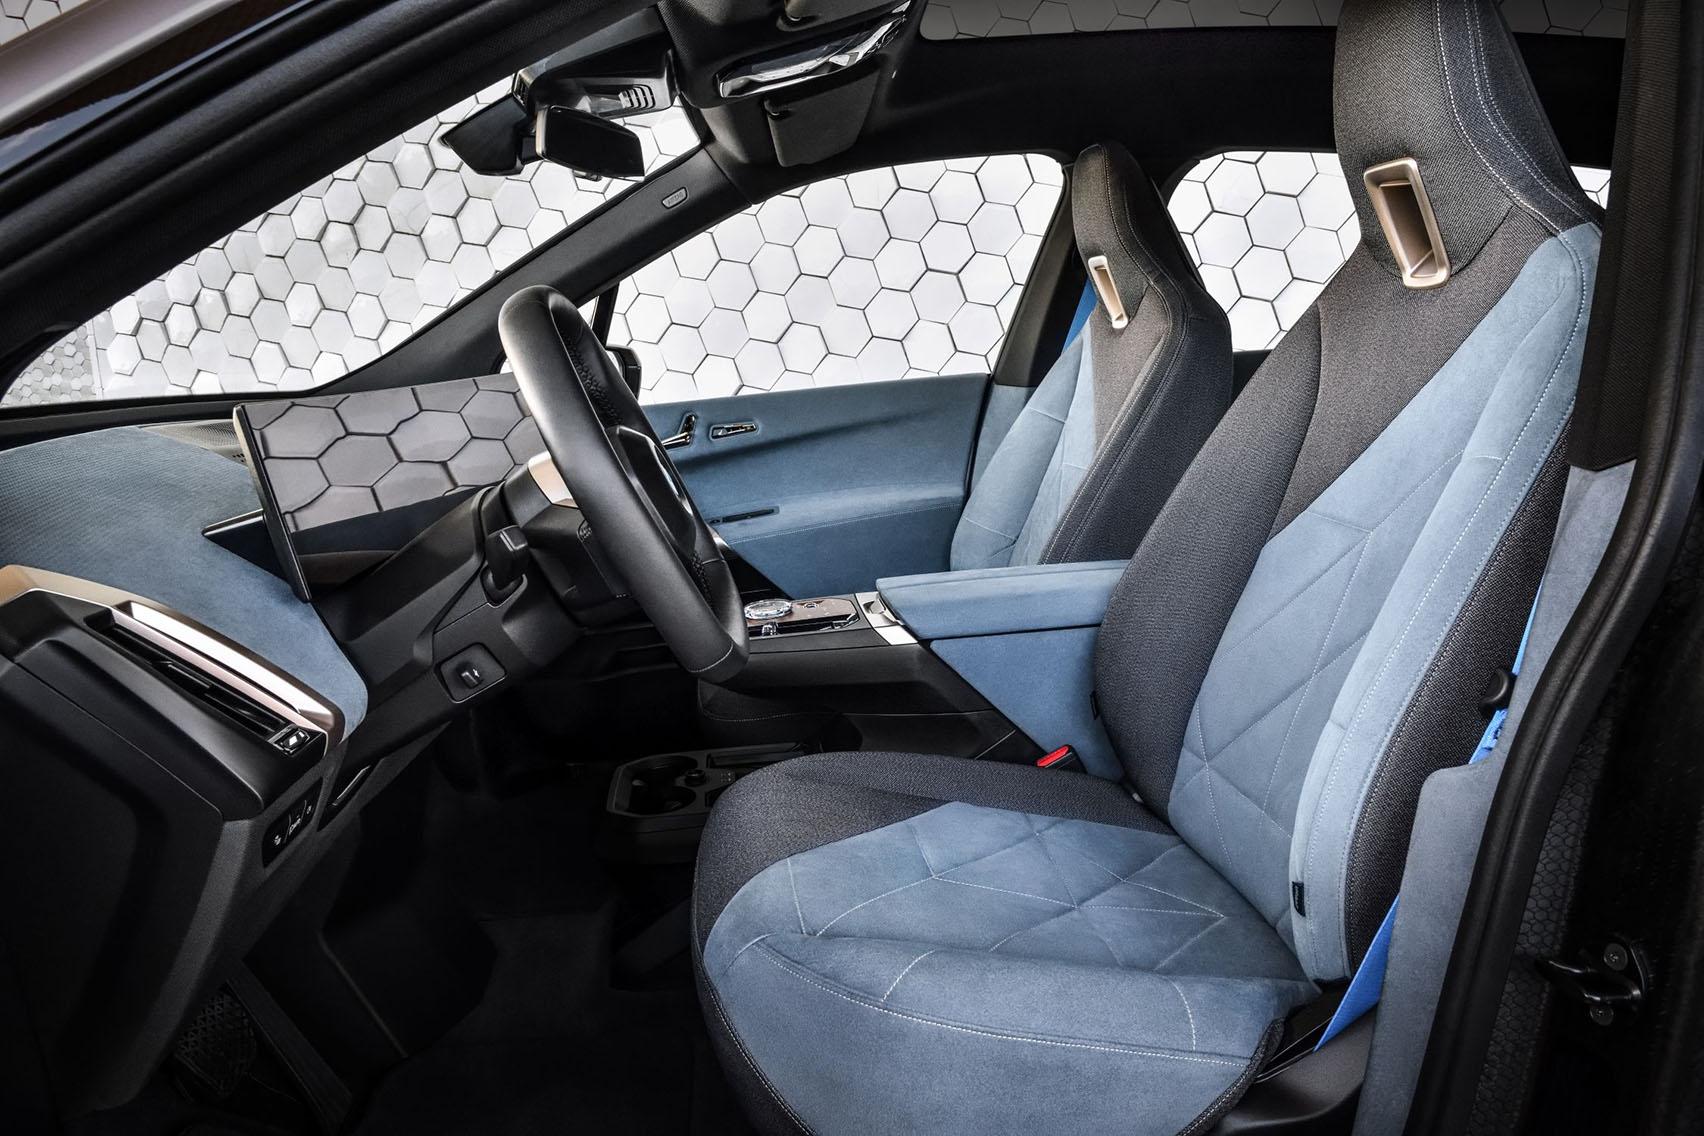 BMW iX electric car interior